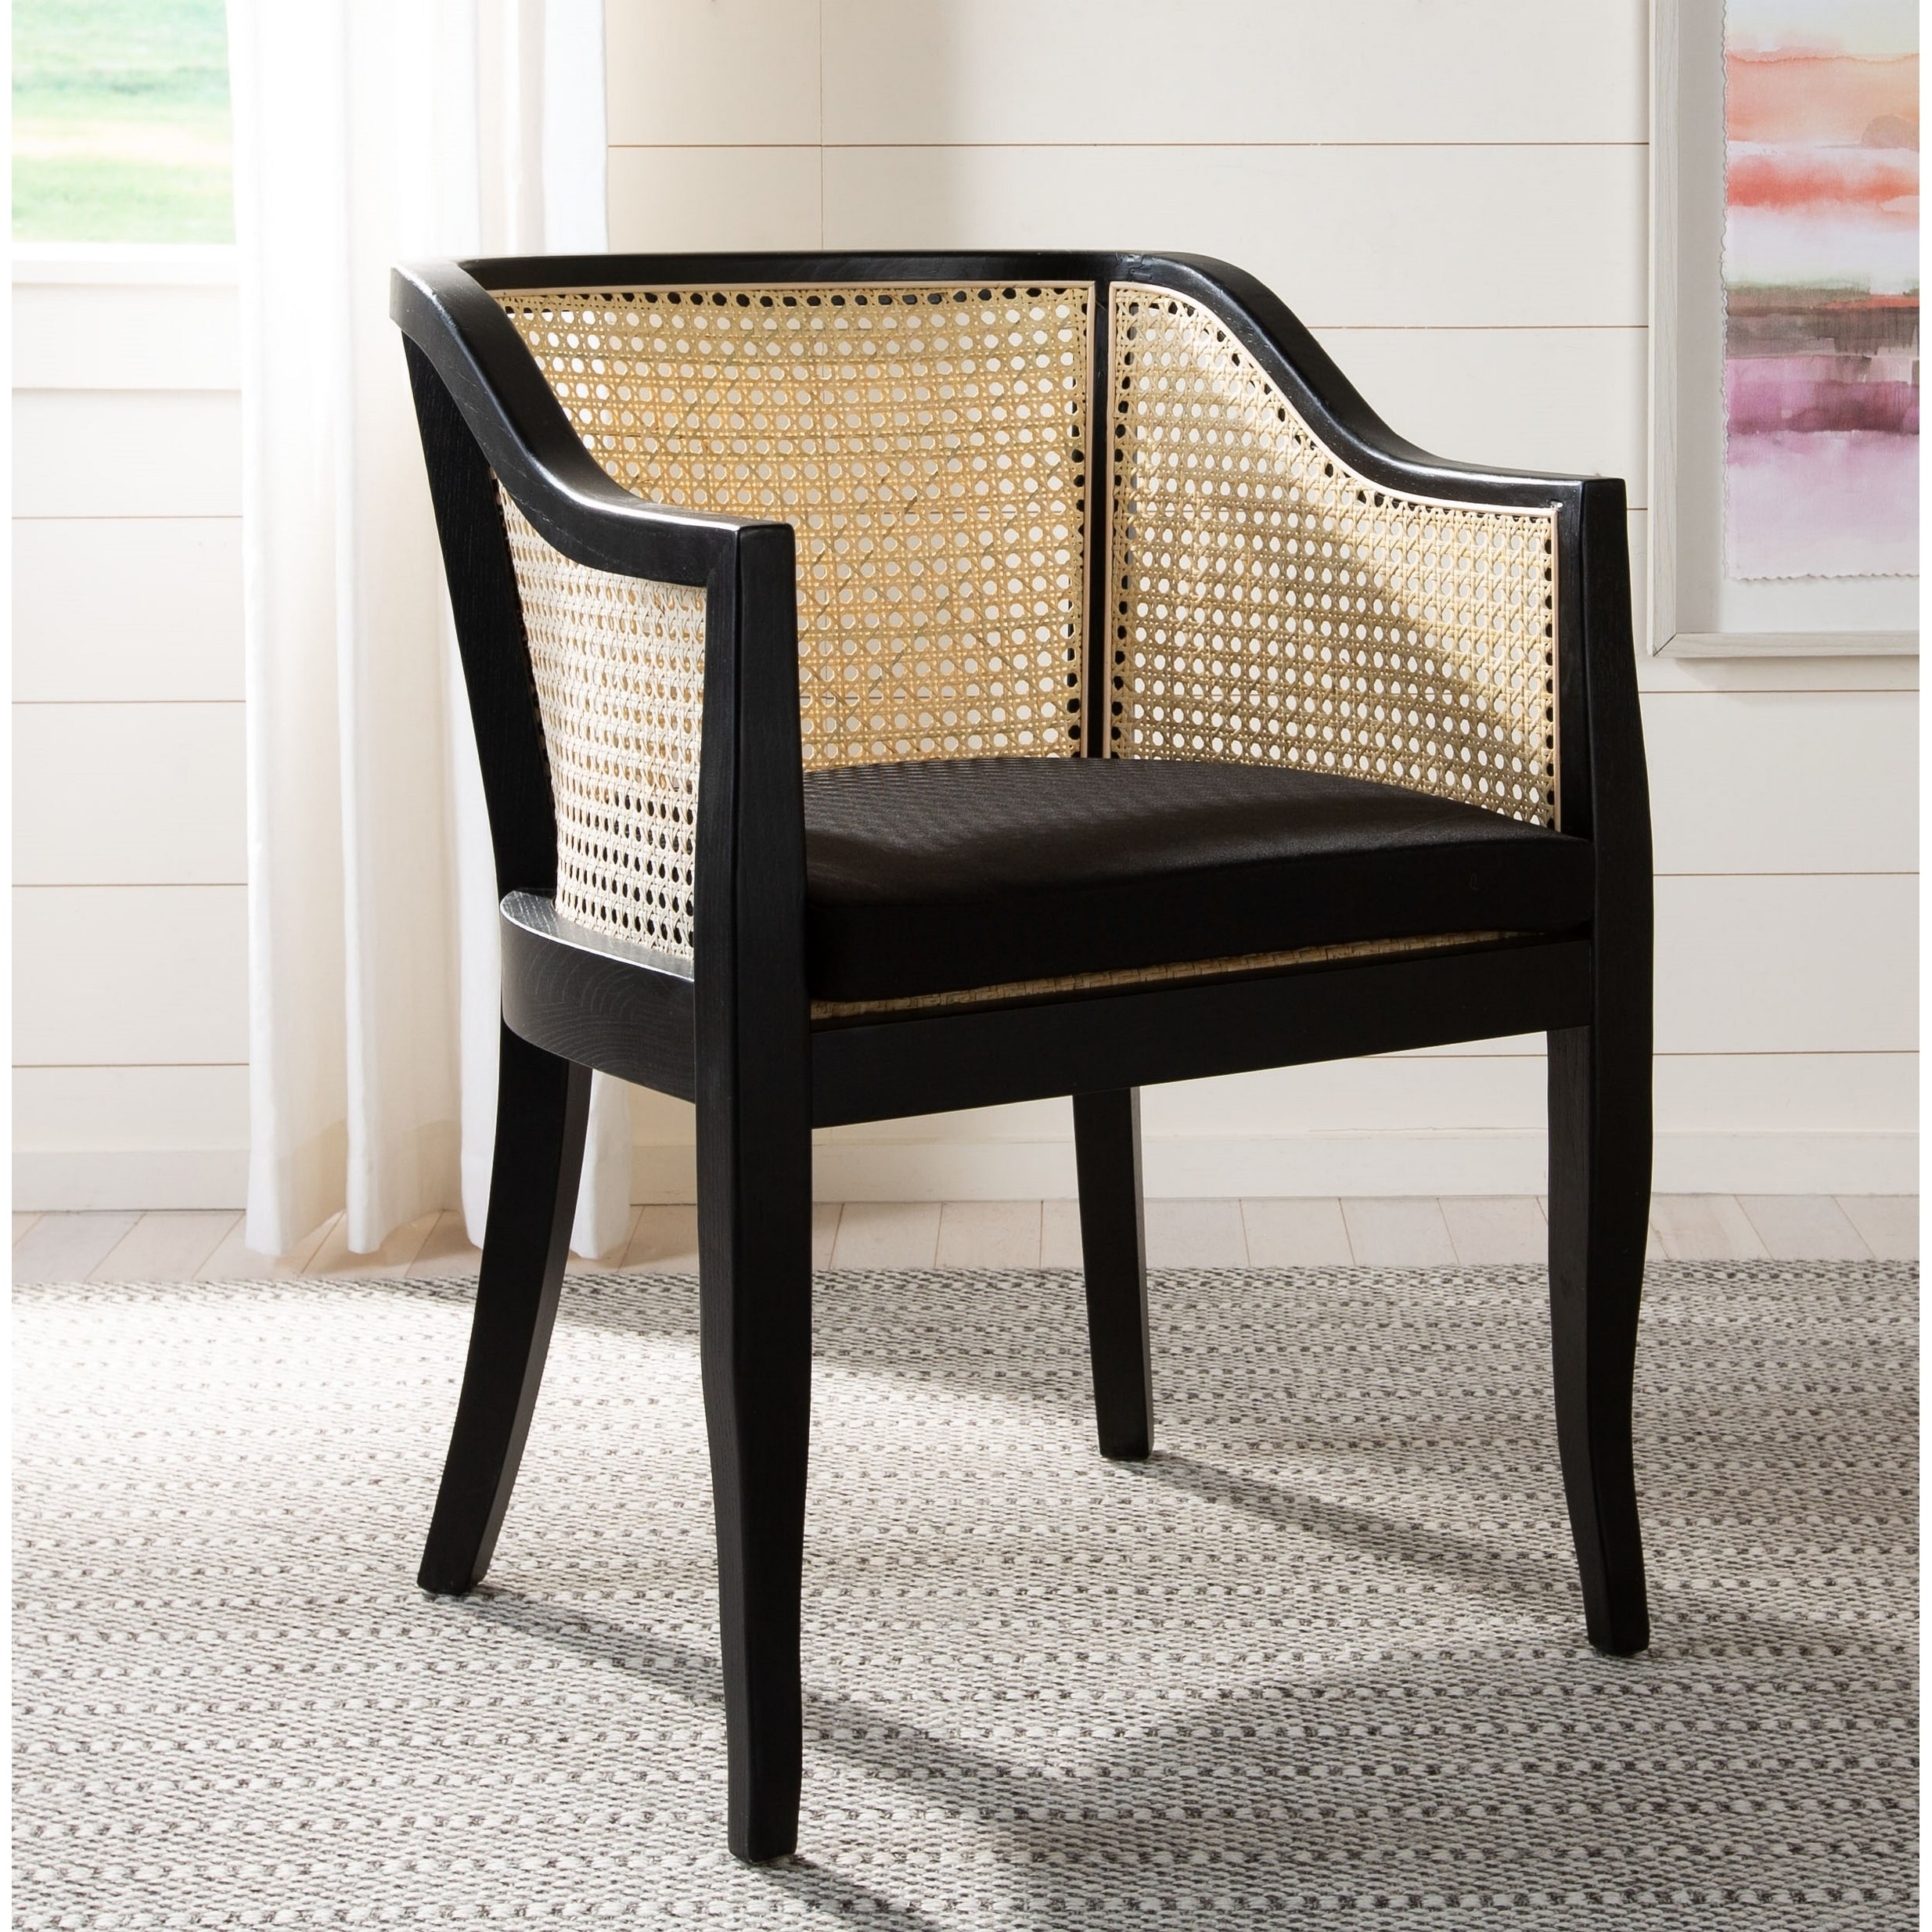 Safavieh Rina Cane Dining Chair 23 8 X 23 2 X 32 1 Overstock 28556559